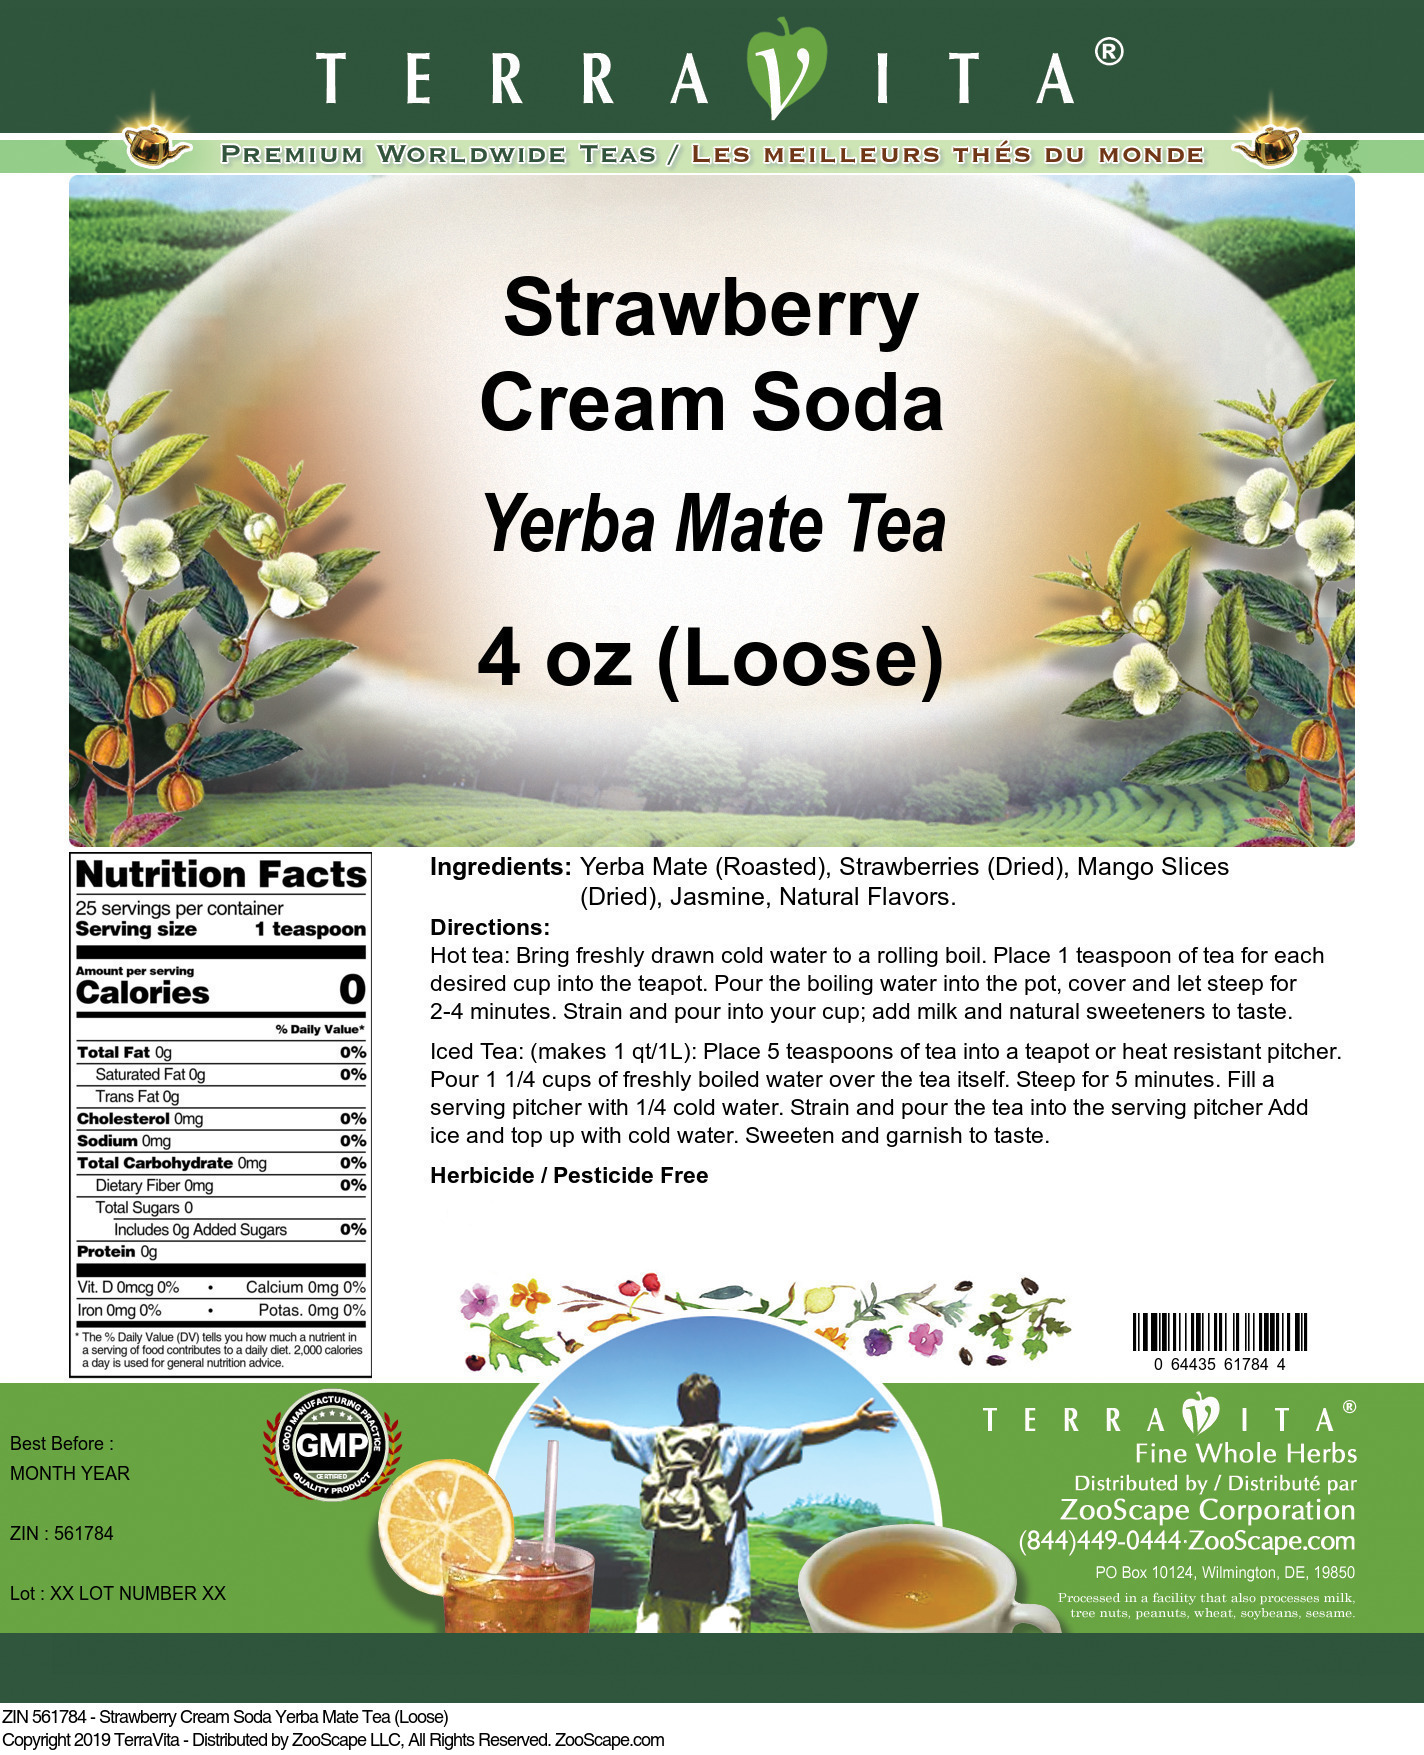 Strawberry Cream Soda Yerba Mate Tea (Loose)